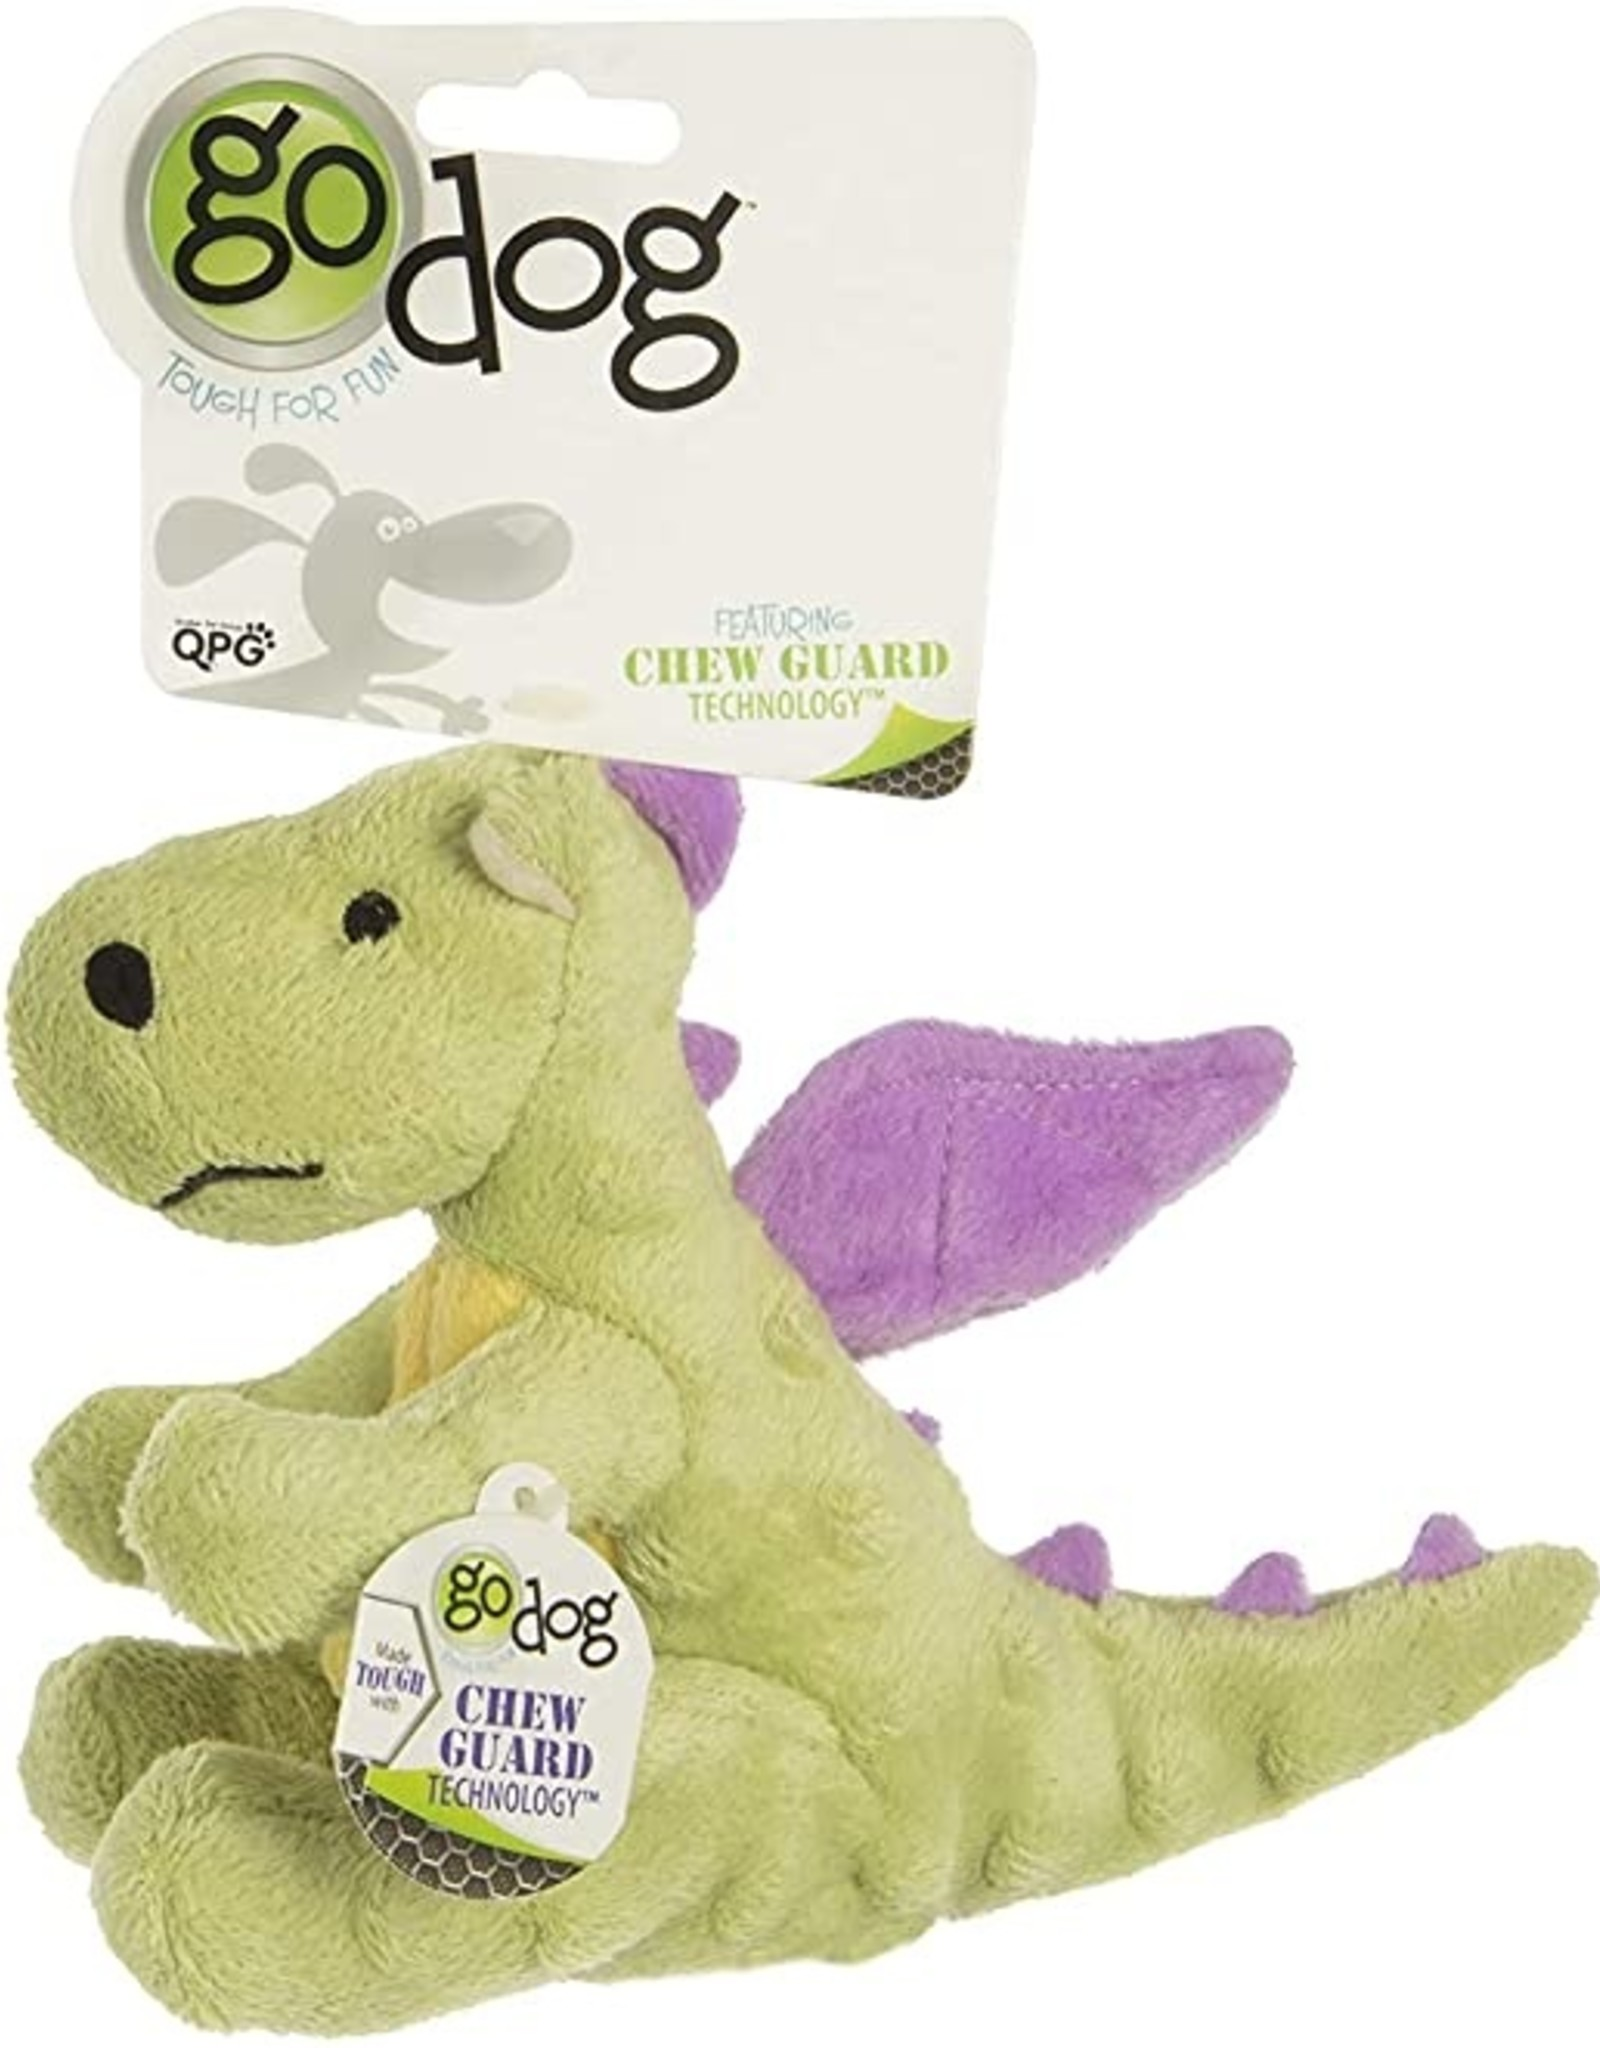 GoDog Dragon - Green (Small)